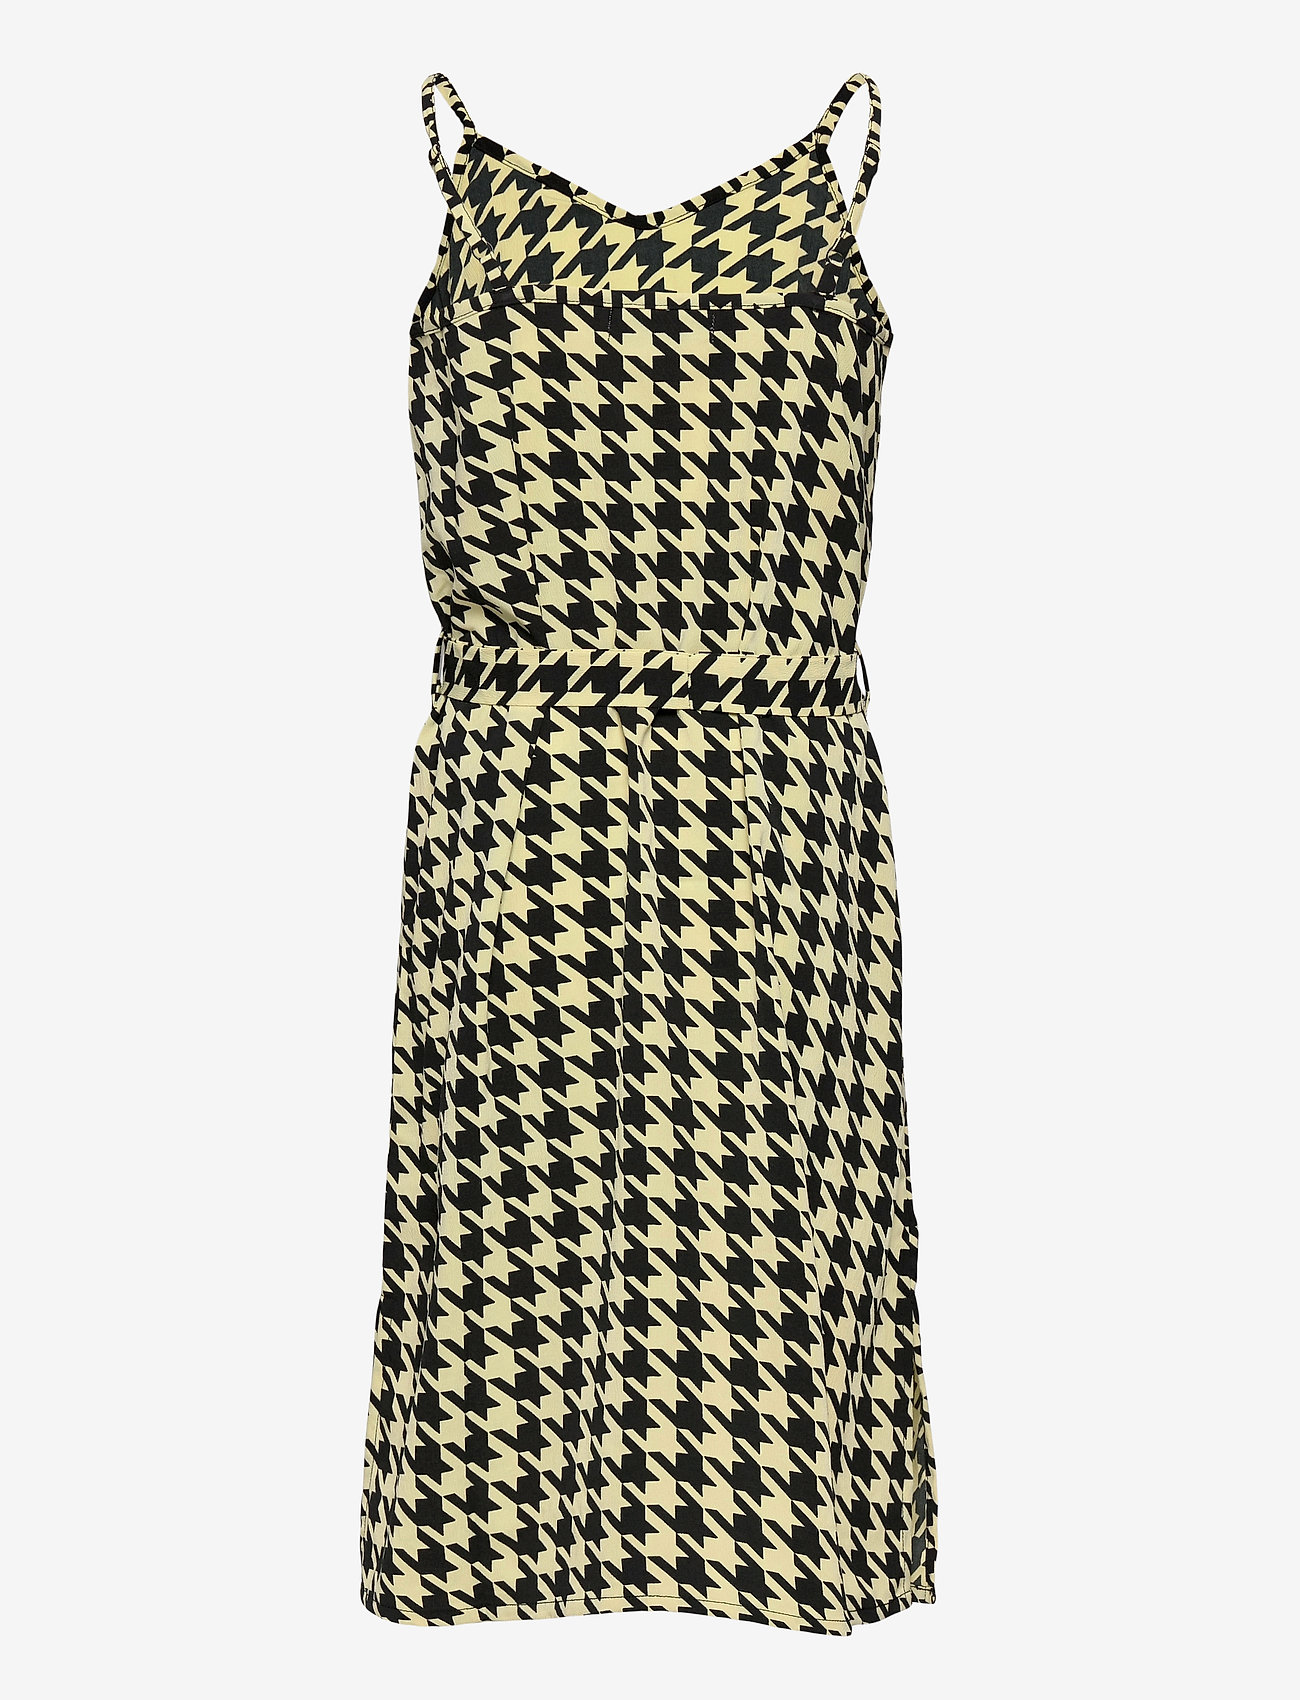 Costbart - NALA SL DRESS - kleider - pale banana - 1